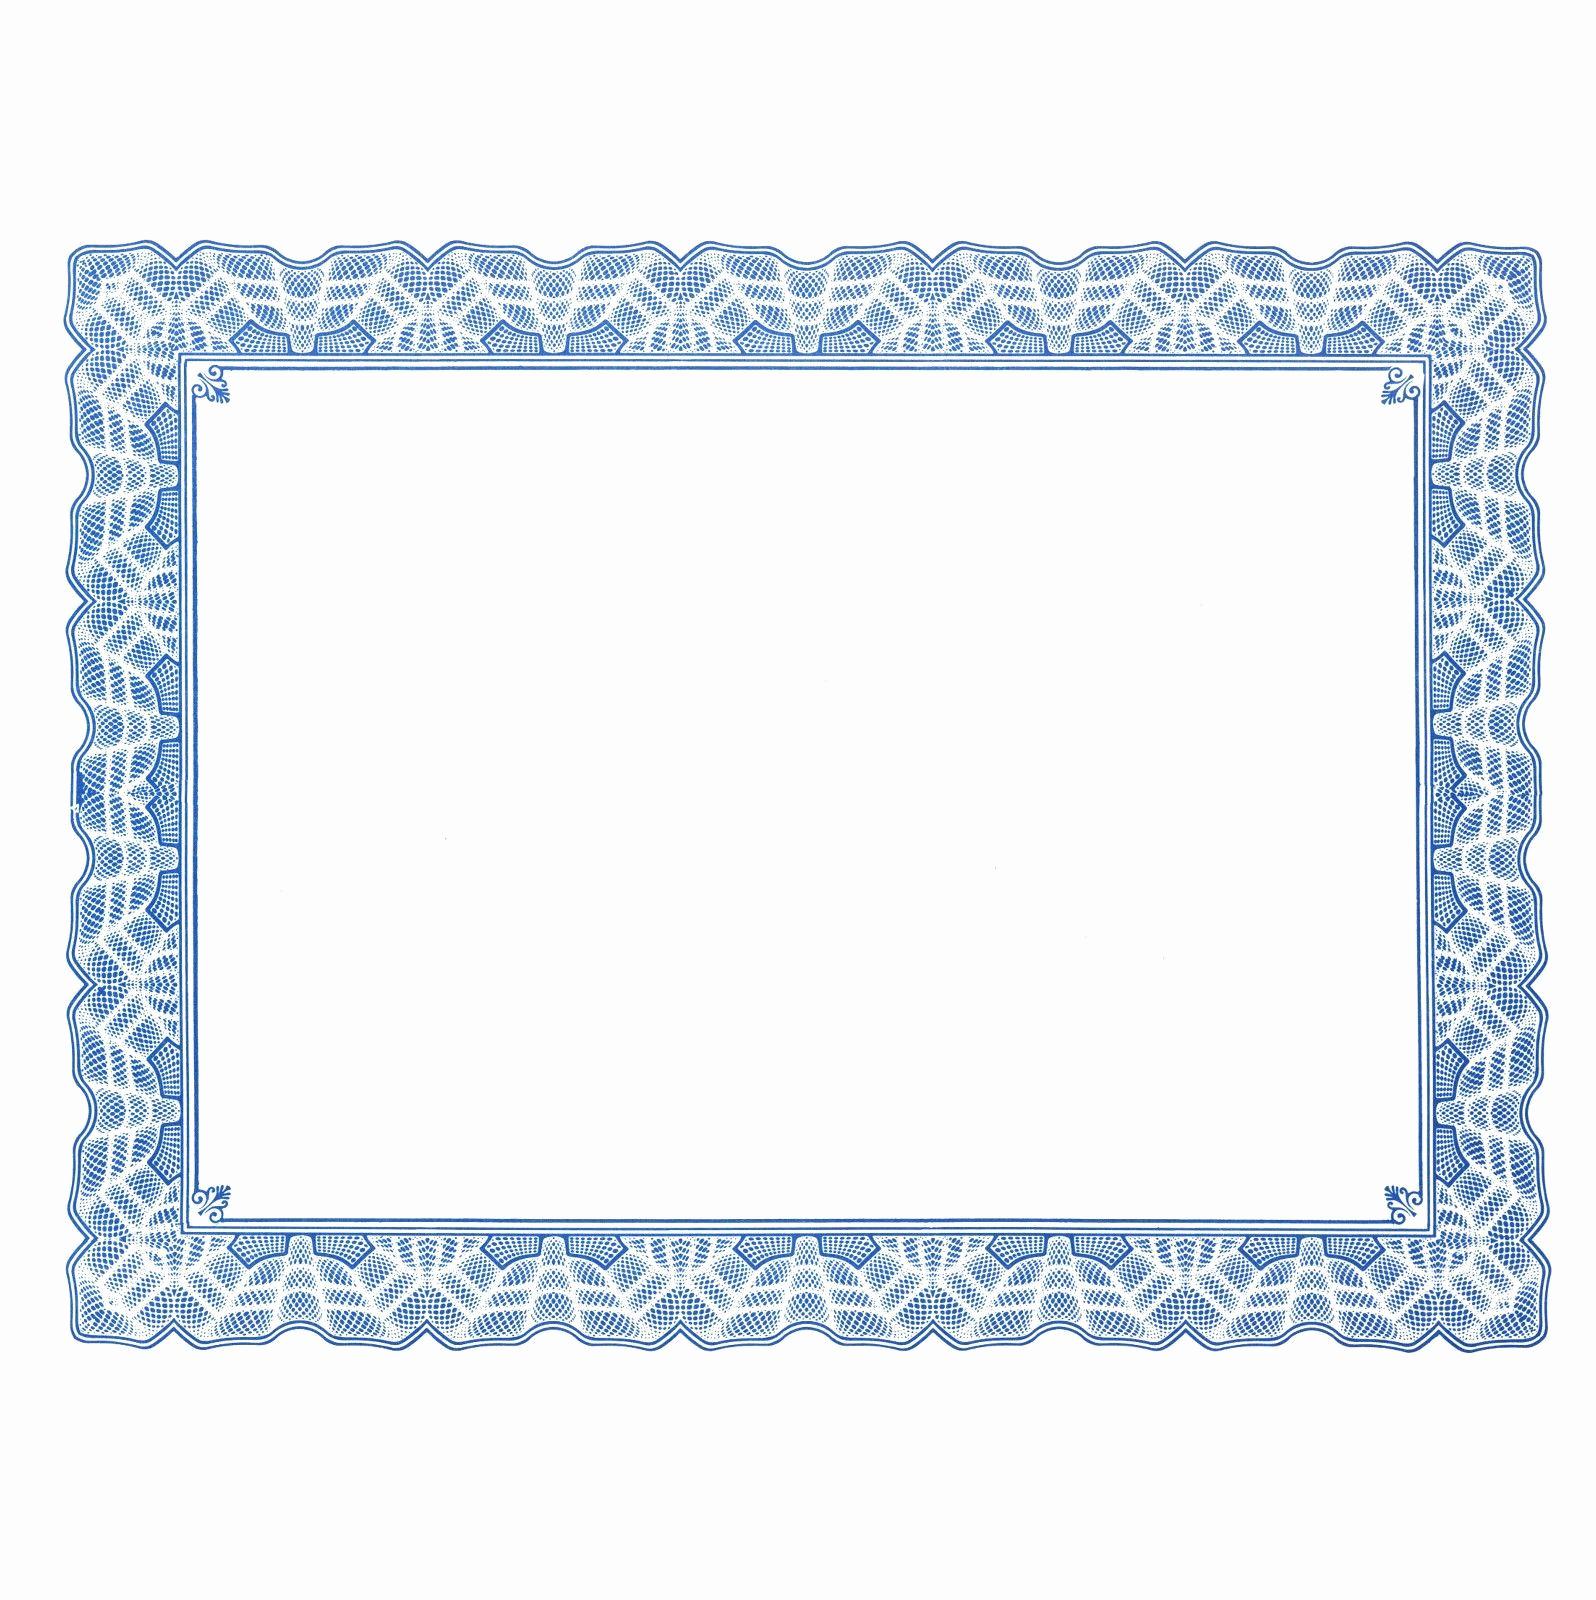 Free Printable Certificate Templates Beautiful Free Certificate Border Templates for Word